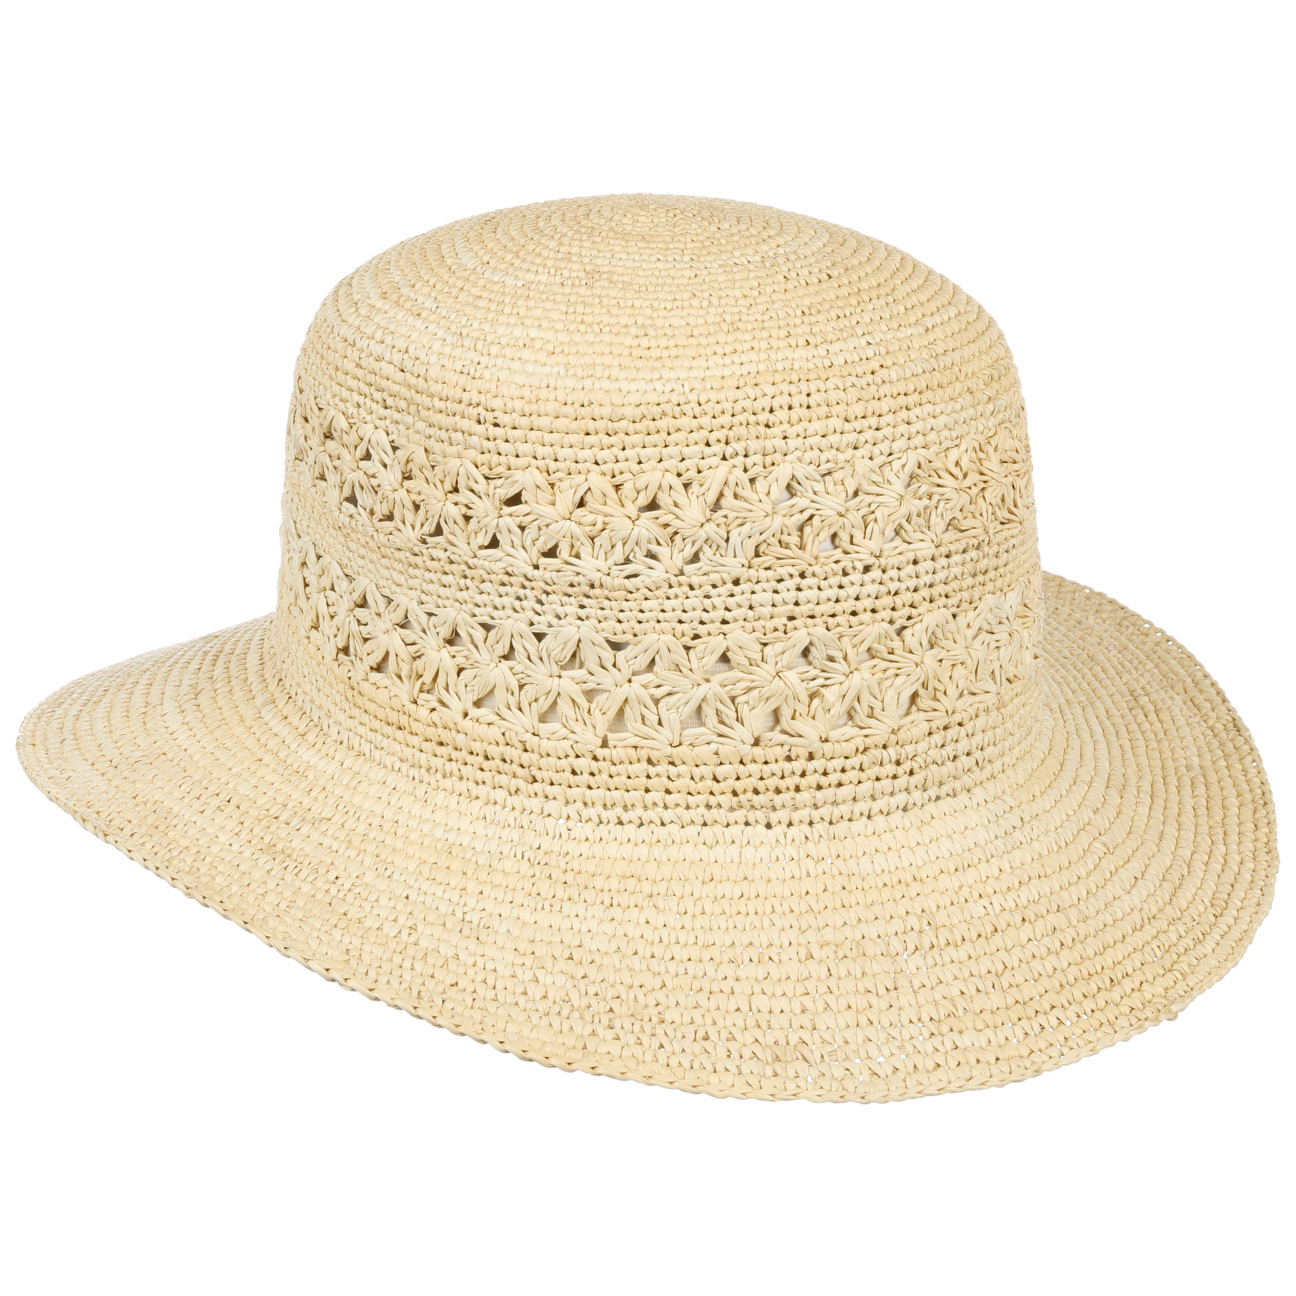 Cloche Crochet Moriah by Mayser  chapeaux de soleil